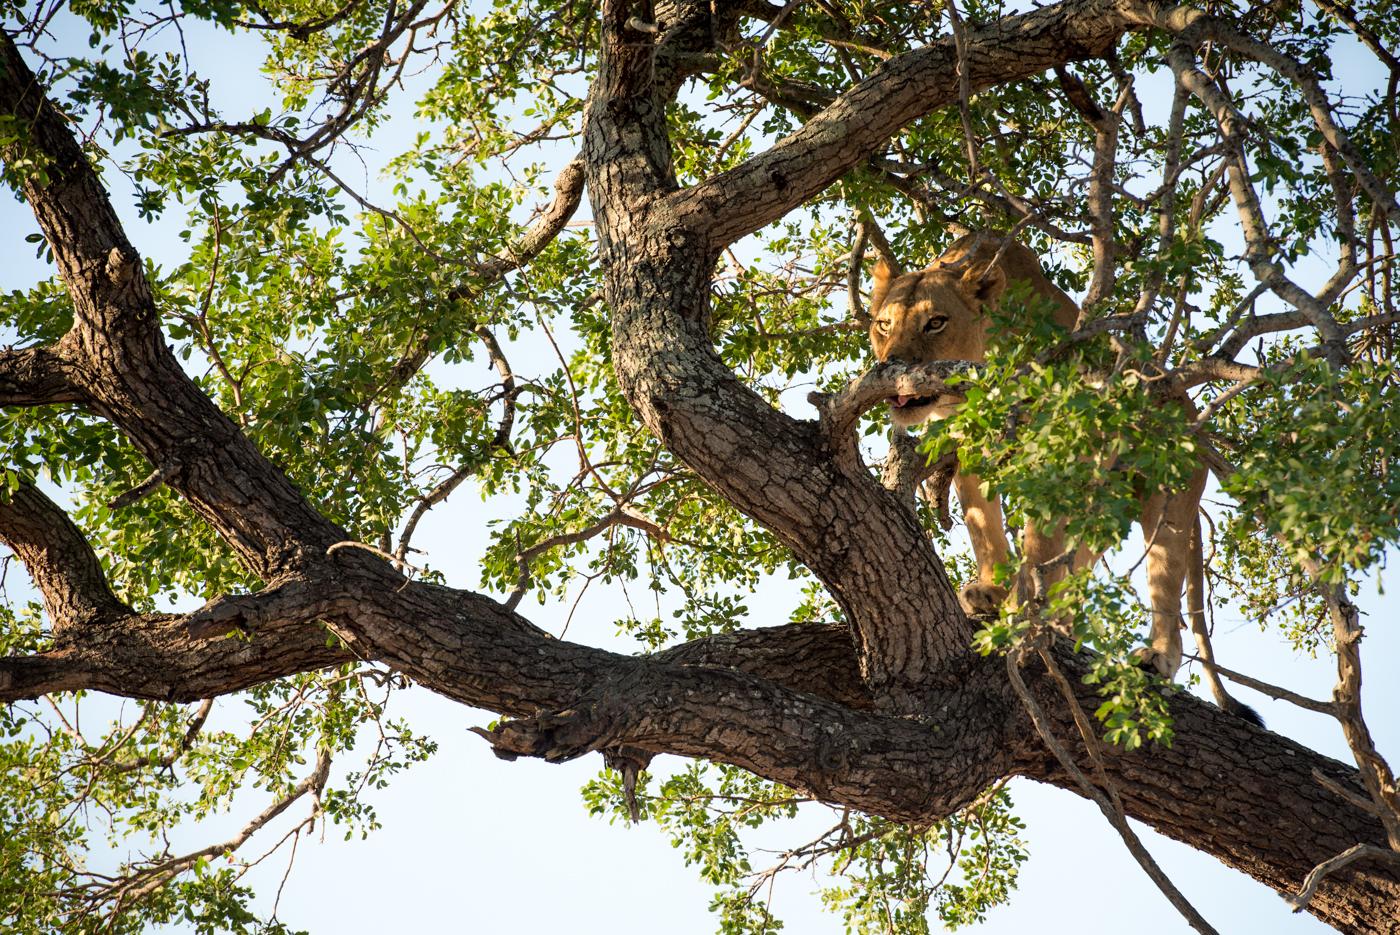 mhangeni lioness subadult in tree, feb 2016, SC